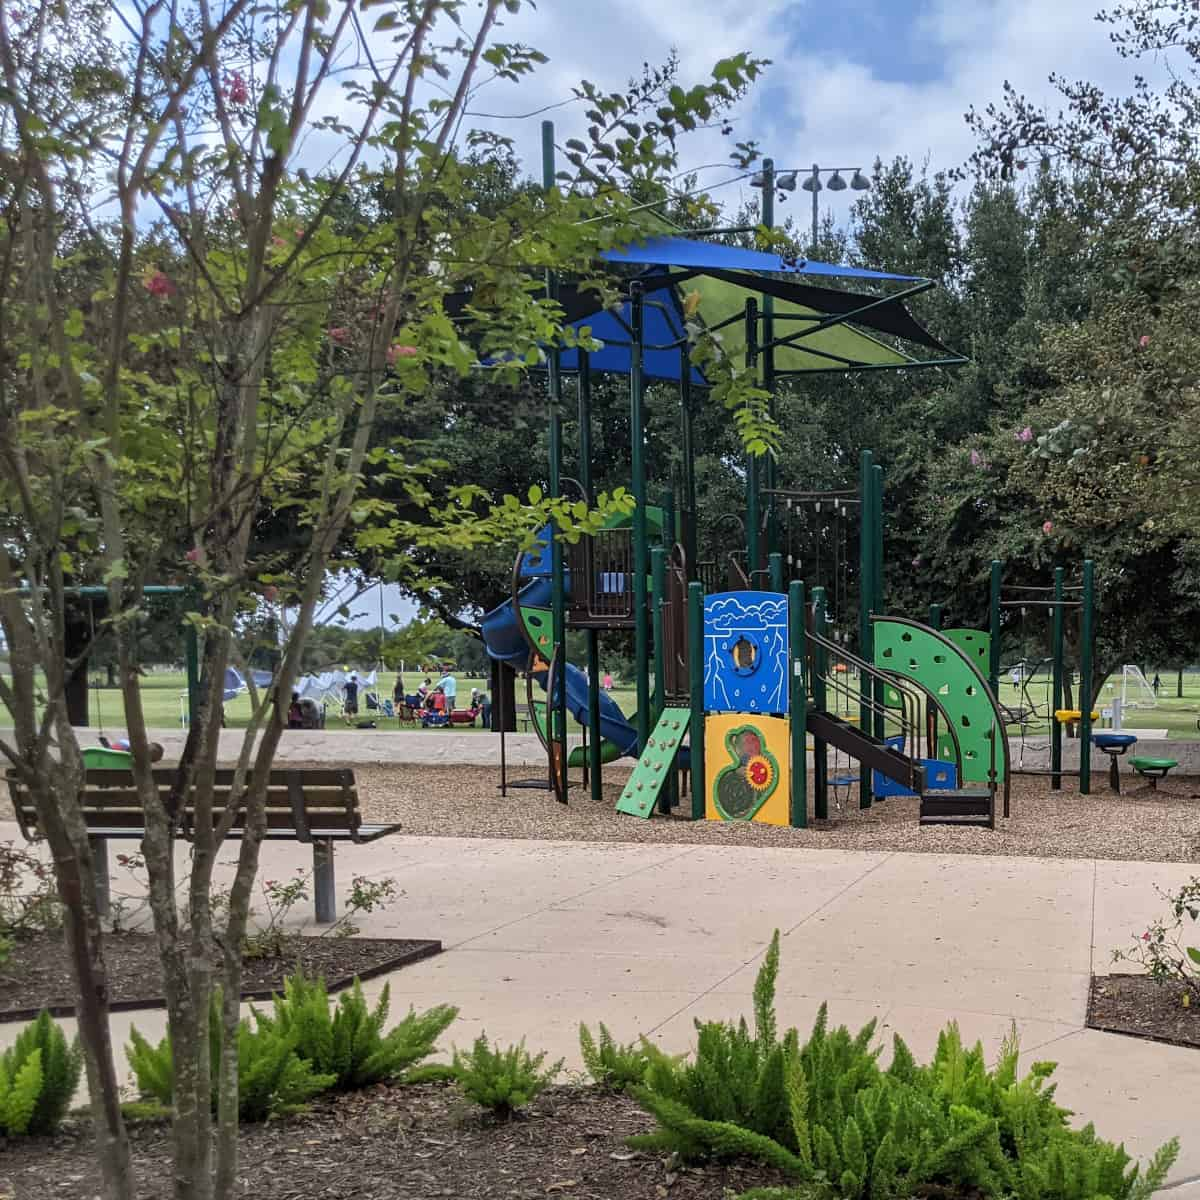 Eldridge Park in Sugar Land